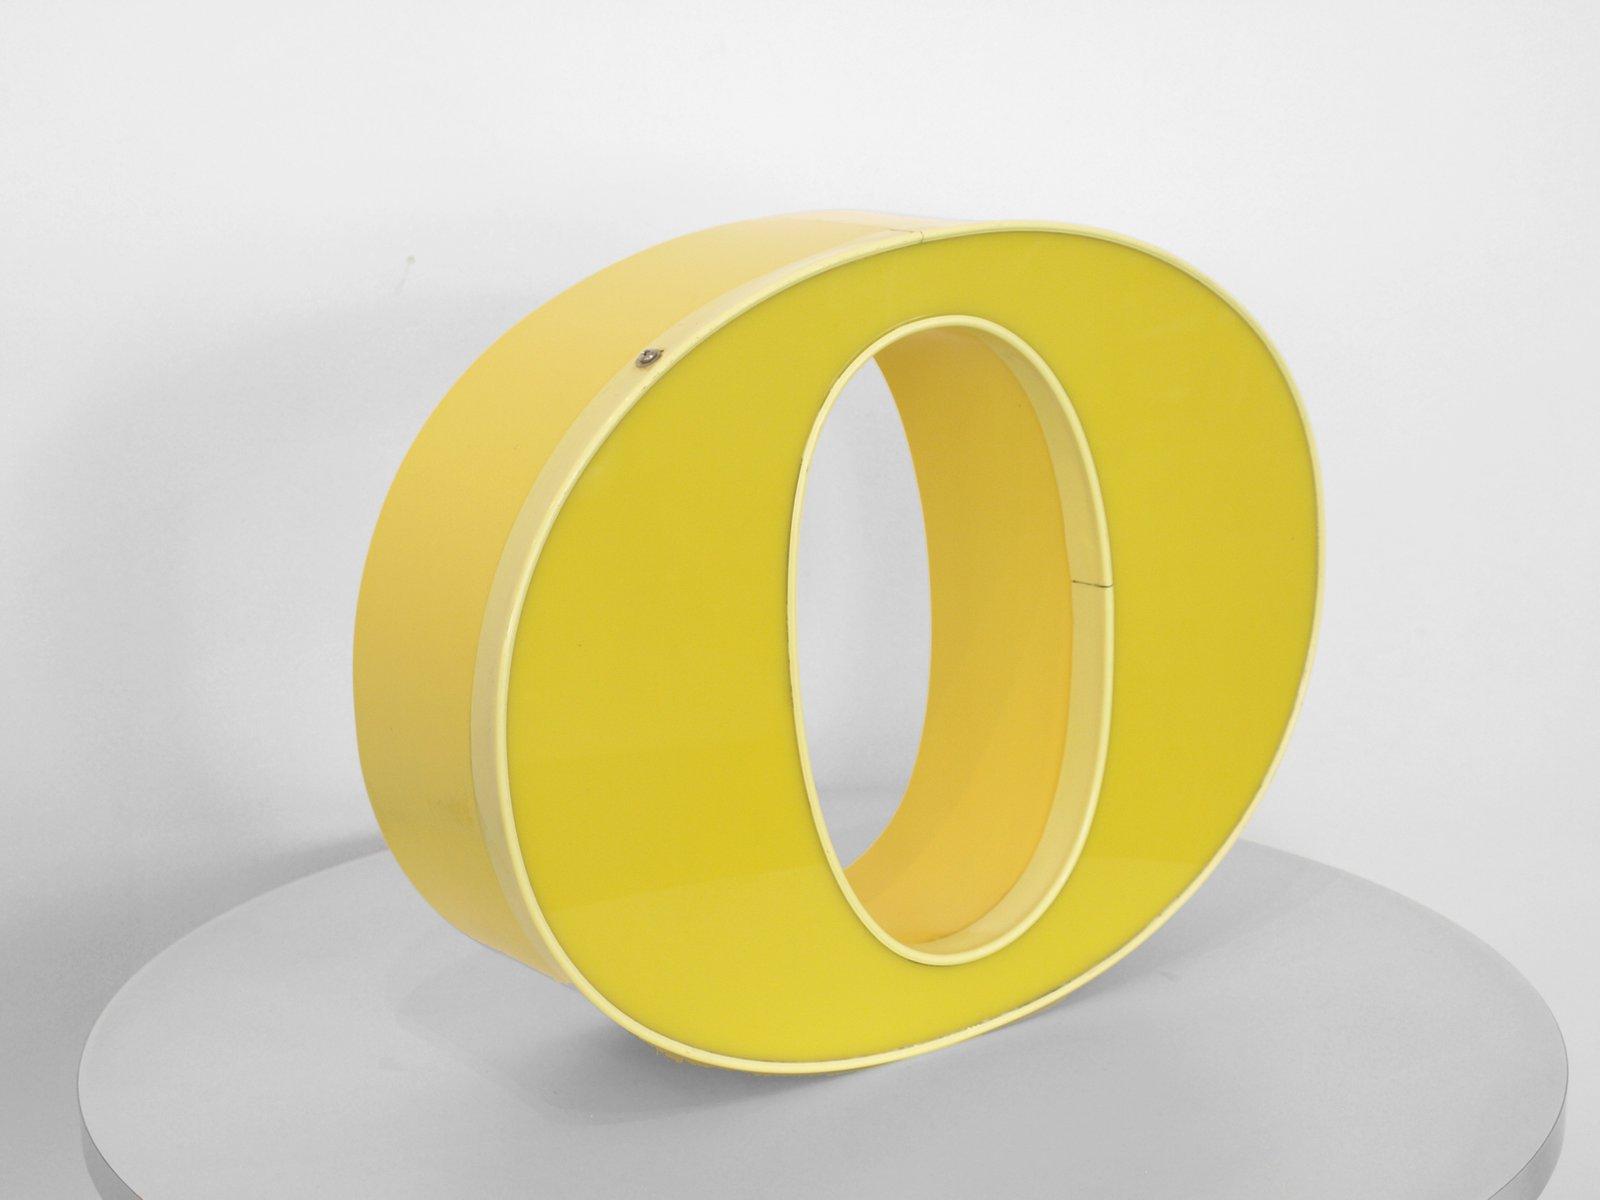 lettre o lumineuse vintage jaune en vente sur pamono. Black Bedroom Furniture Sets. Home Design Ideas